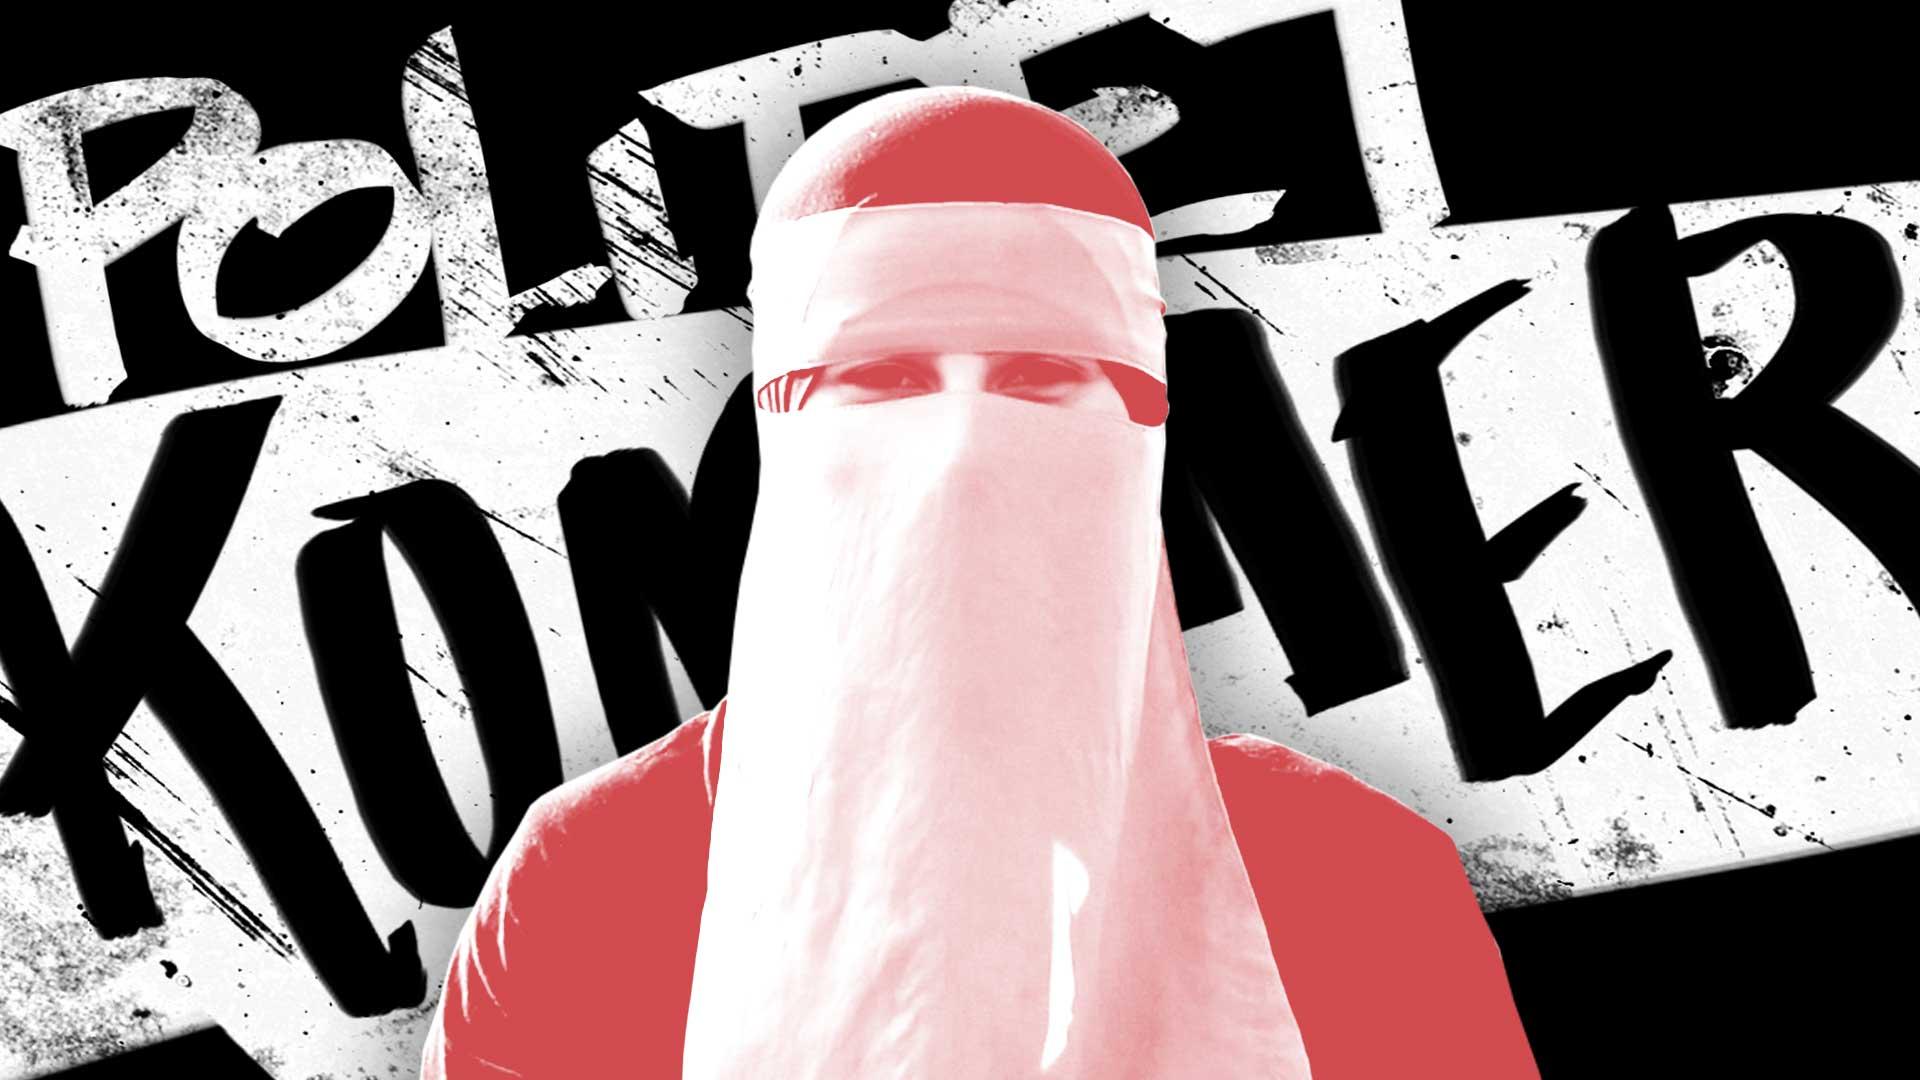 Meryem bryder 'burkaloven': – Jeg har max 10 minutter før politiet kommer)